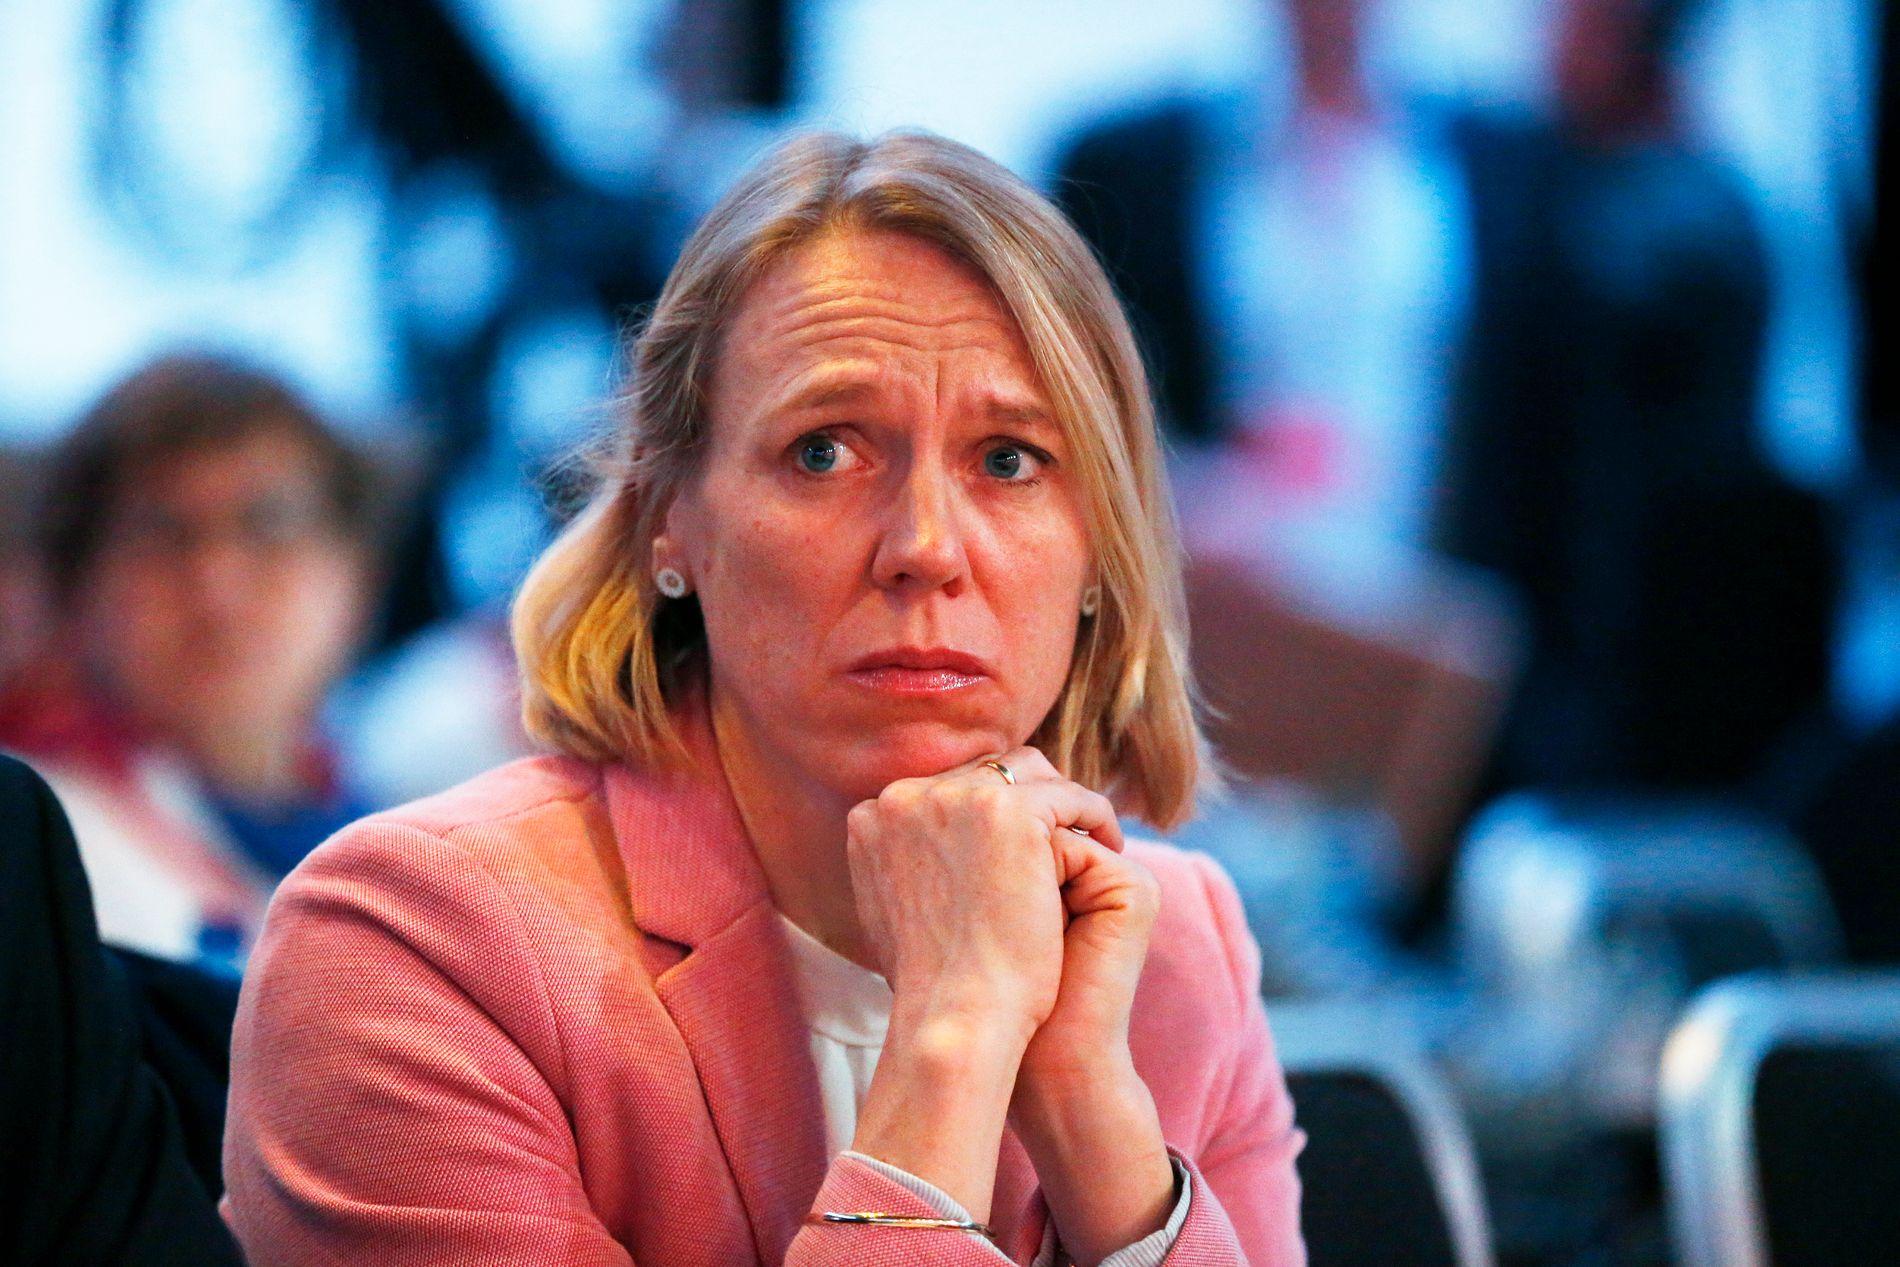 TROR IKKE PÅ REFORHANDLINGER: Aps Anniken Huitfeldt. Her under Arbeiderpartiets landsmøte på Folkets Hus.